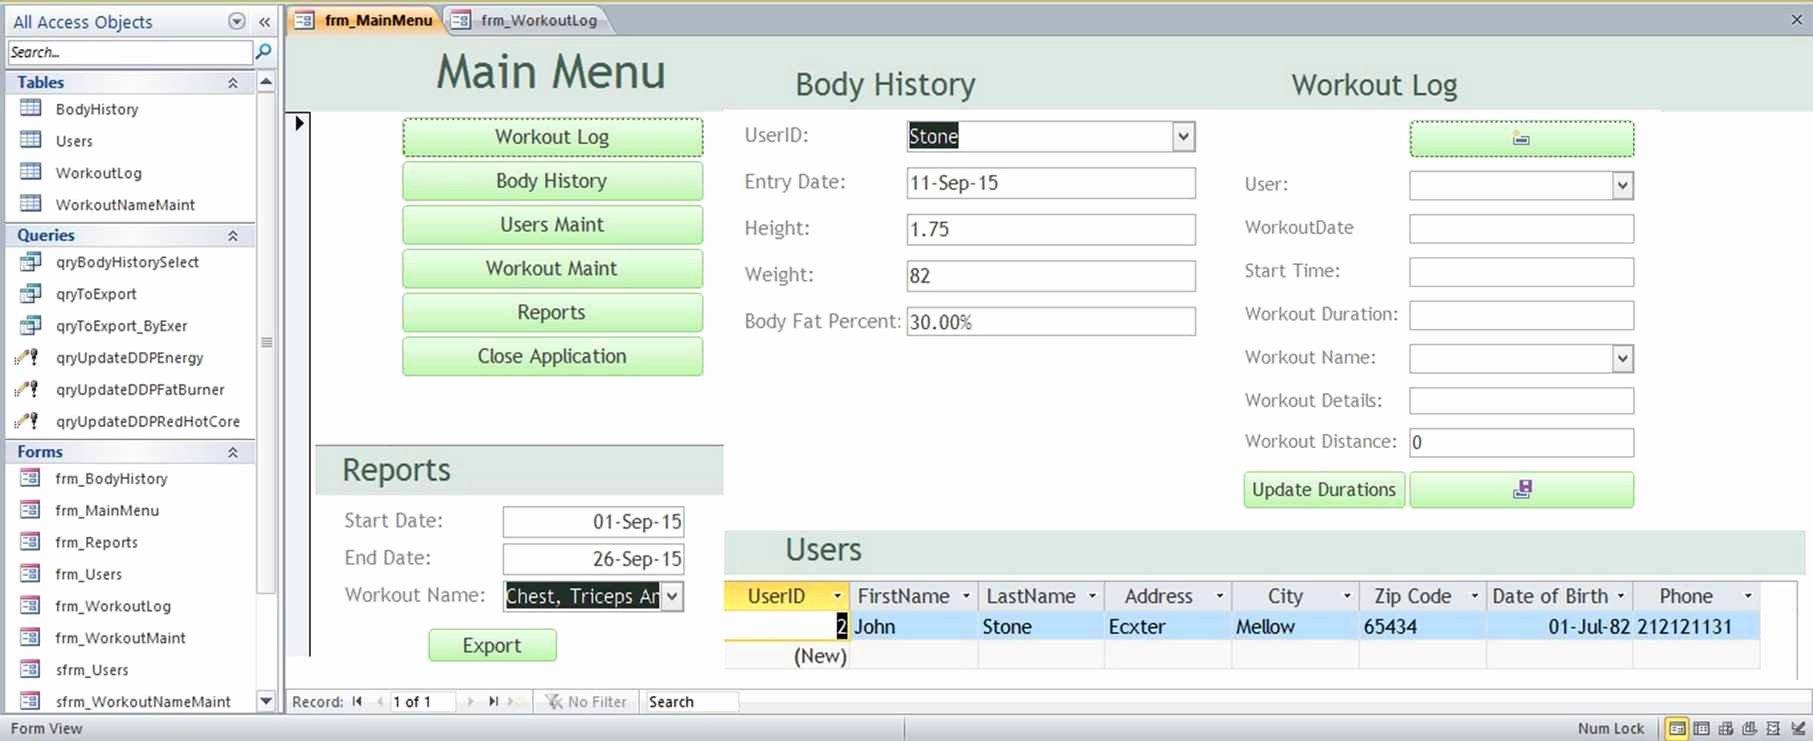 Free Ms Access Templates Inspirational Microsoft Access Family Tree Genealogy History Templates